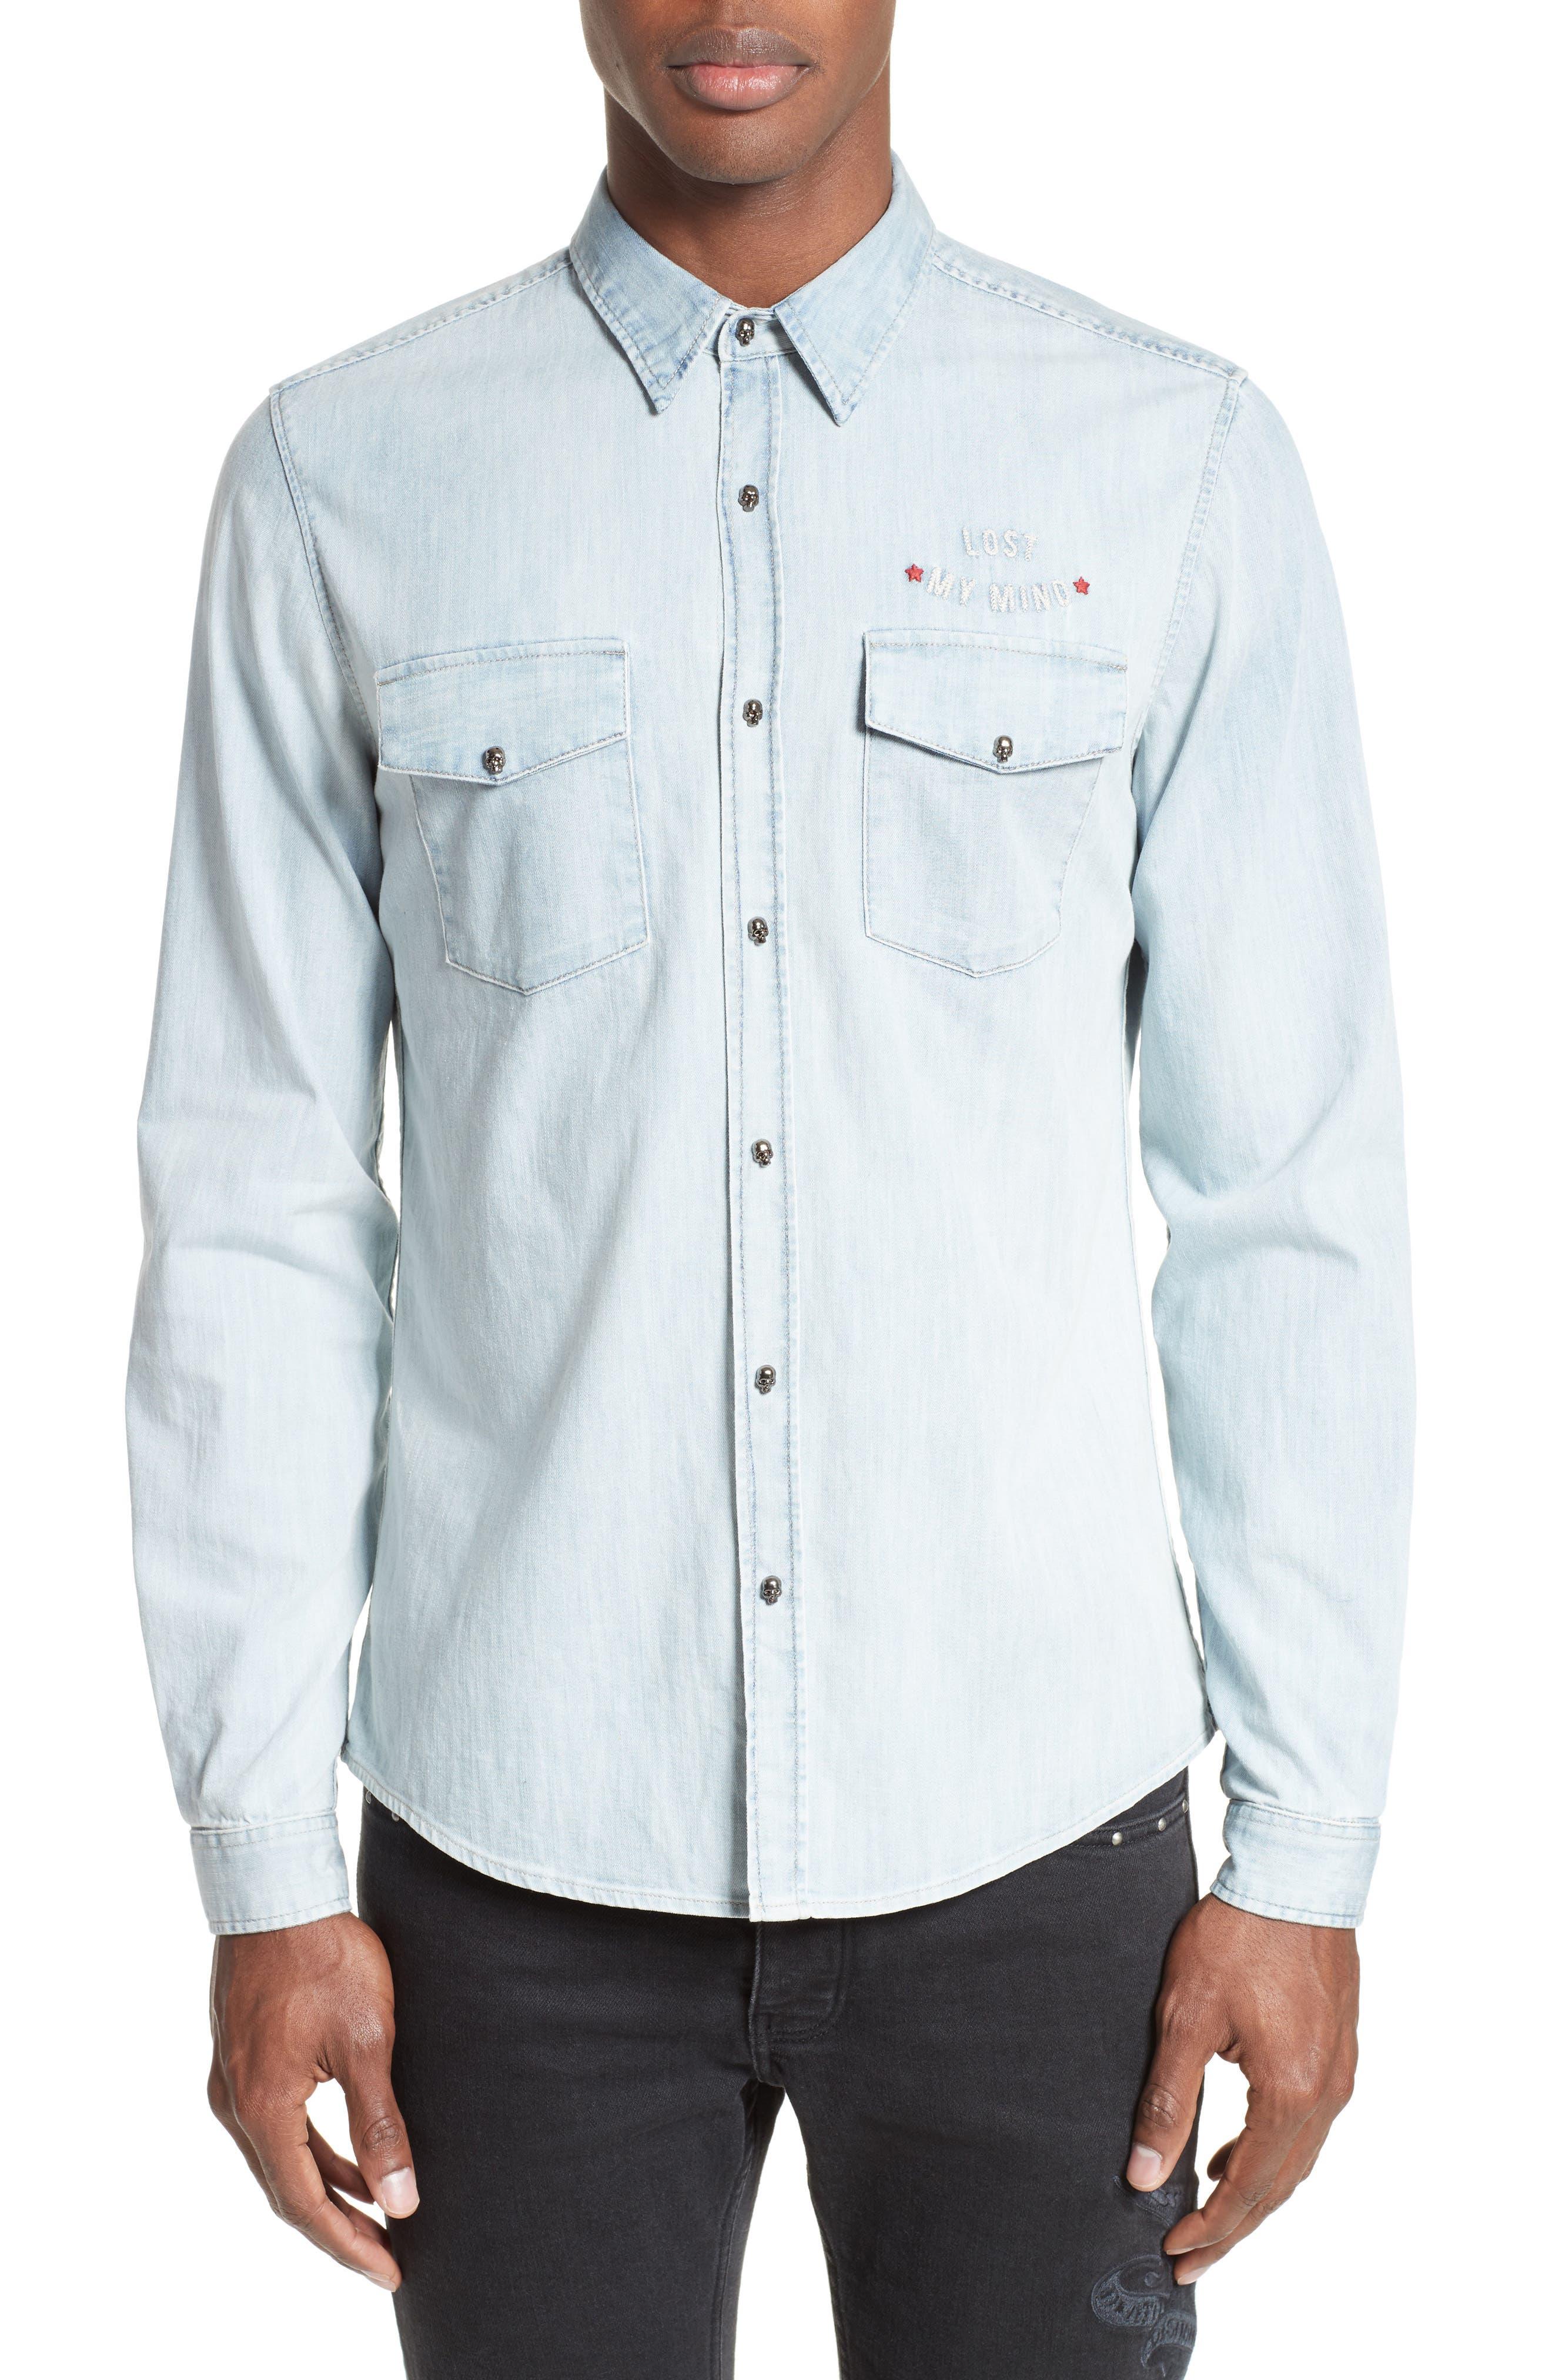 Main Image - The Kooples Embroidered Denim Shirt